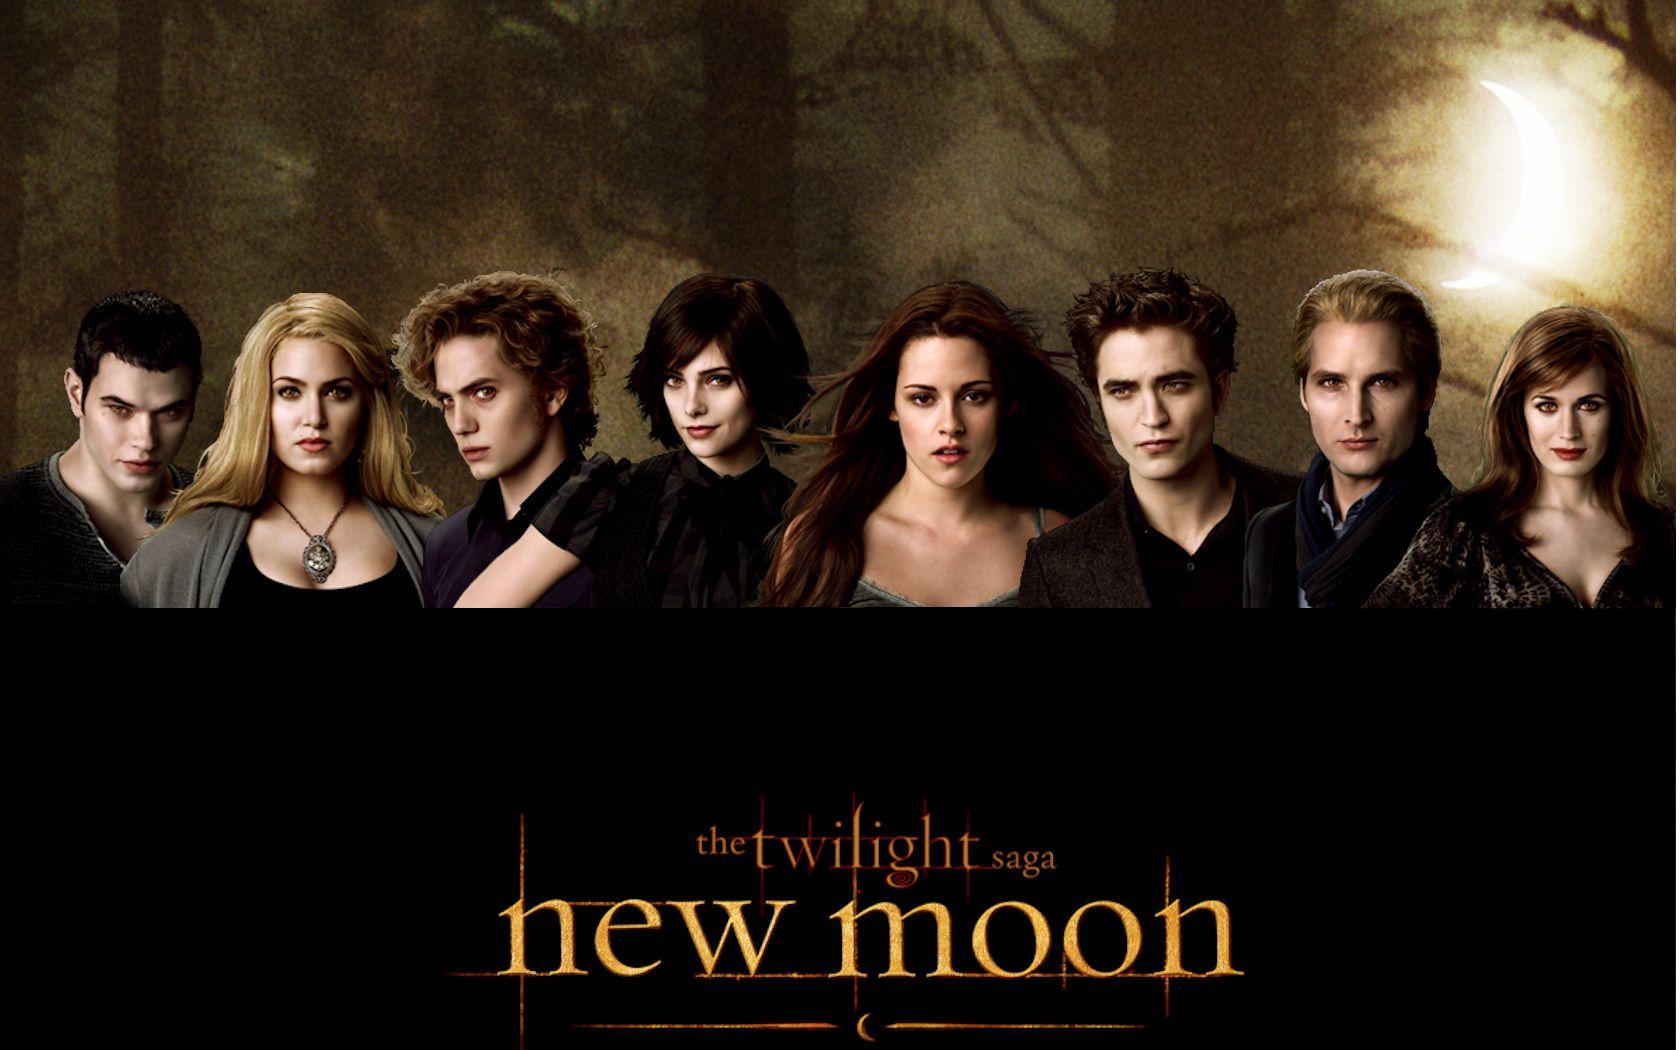 New Moon Twilight Series Wallpaper Twilight New Moon Twilight Saga Twilight Saga New Moon